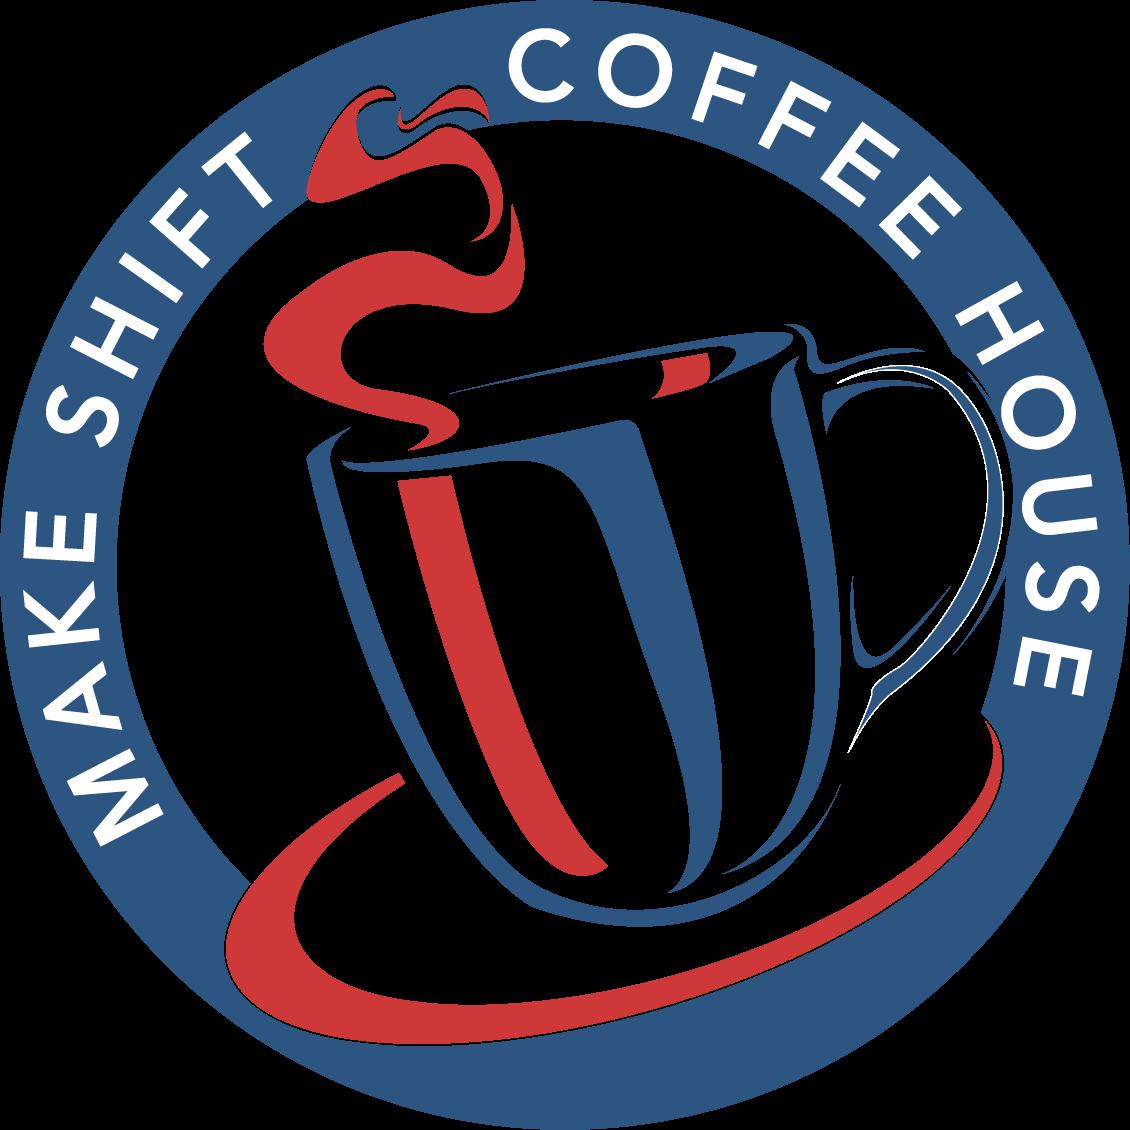 Make Shift Coffeehouse - Make Shift Coffeehouse